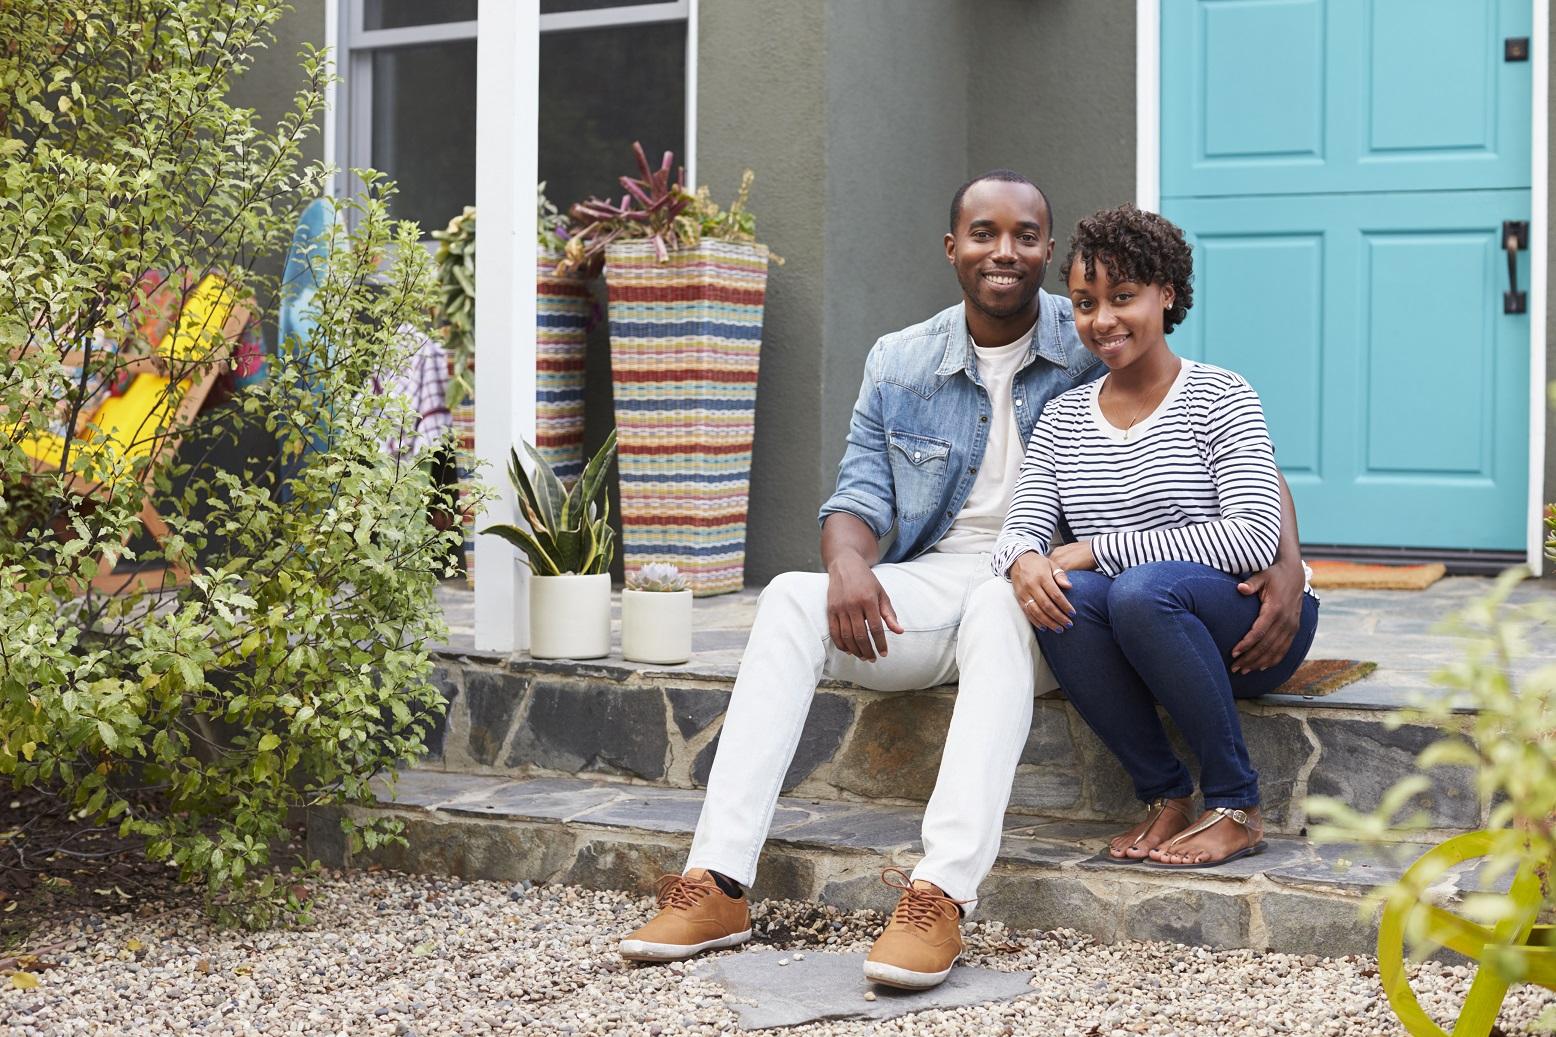 Reforma valoriza sua casa